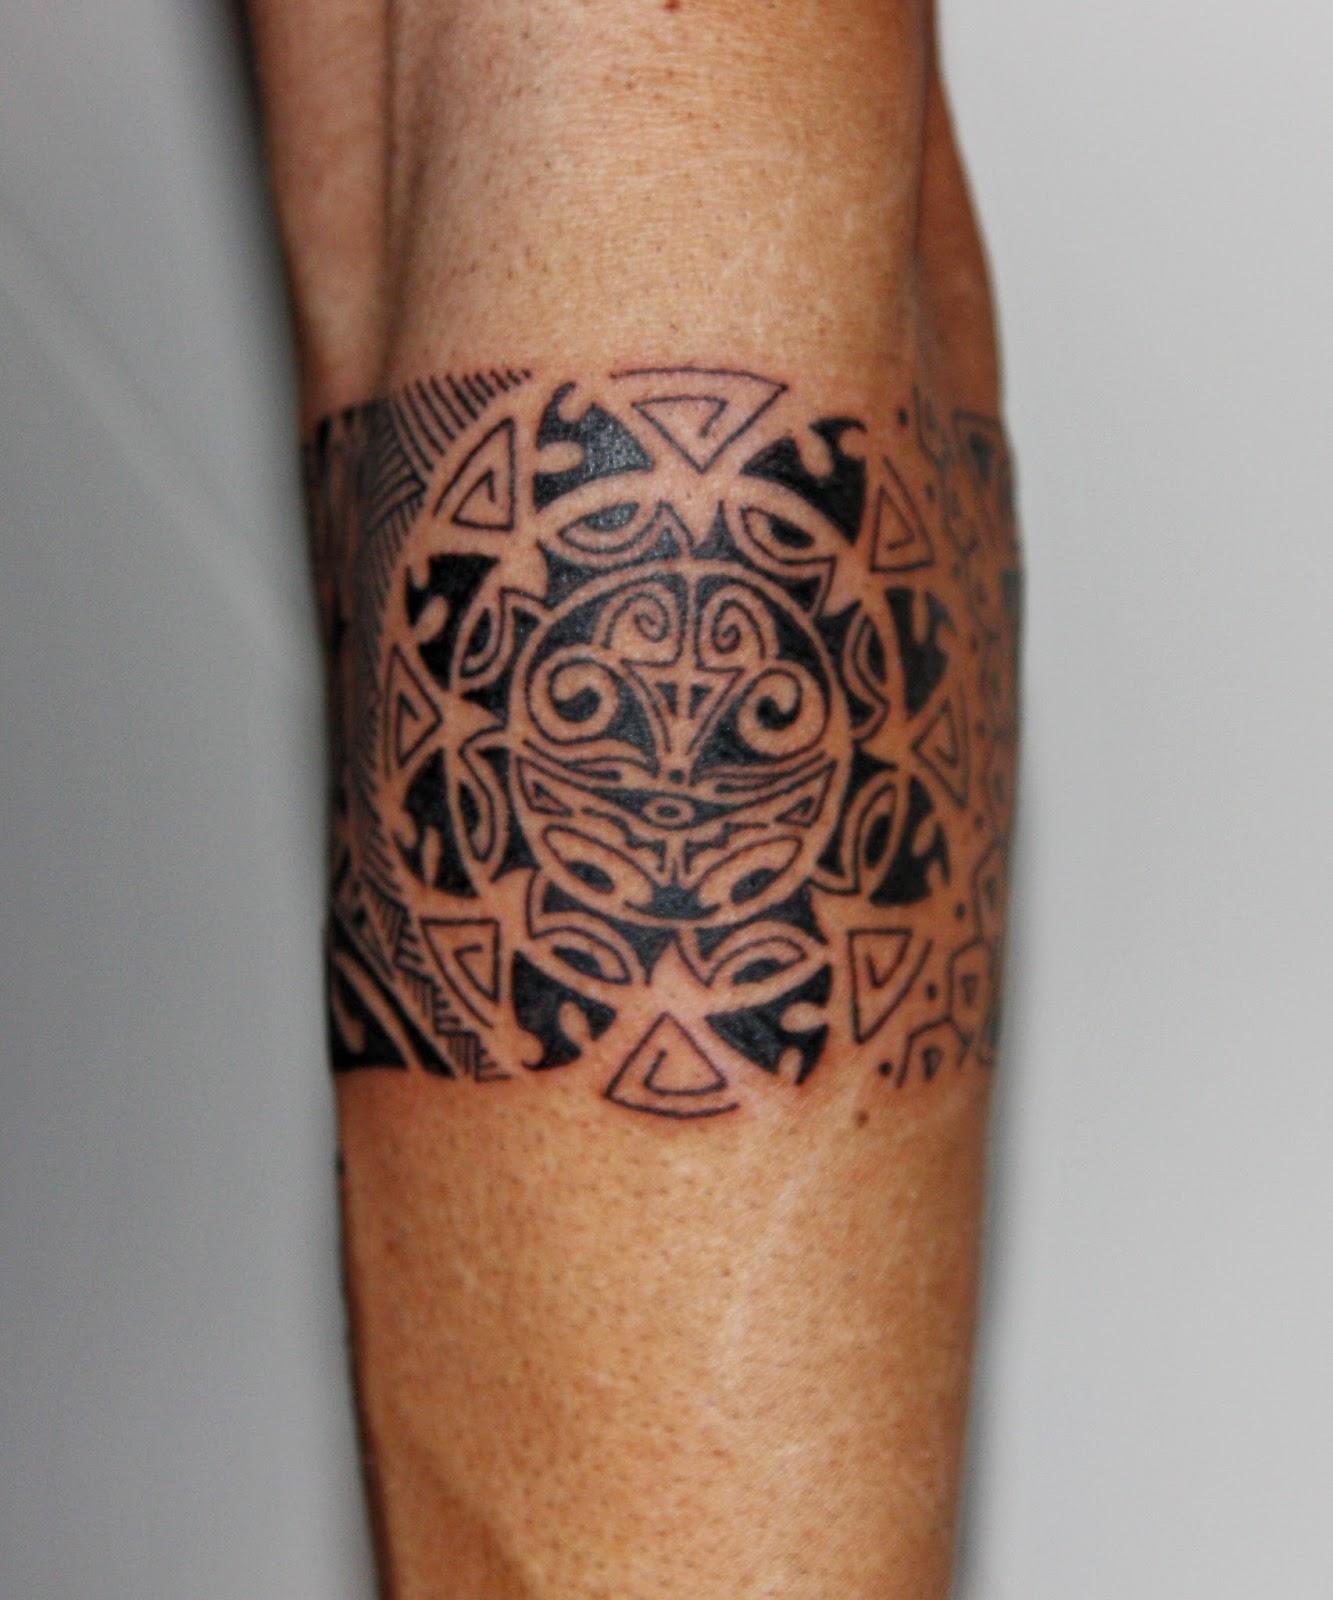 Brazalete Maori Luna Y Sol Y Frase Coral Rodriguez Tattoo - Maori-tattoo-brazalete